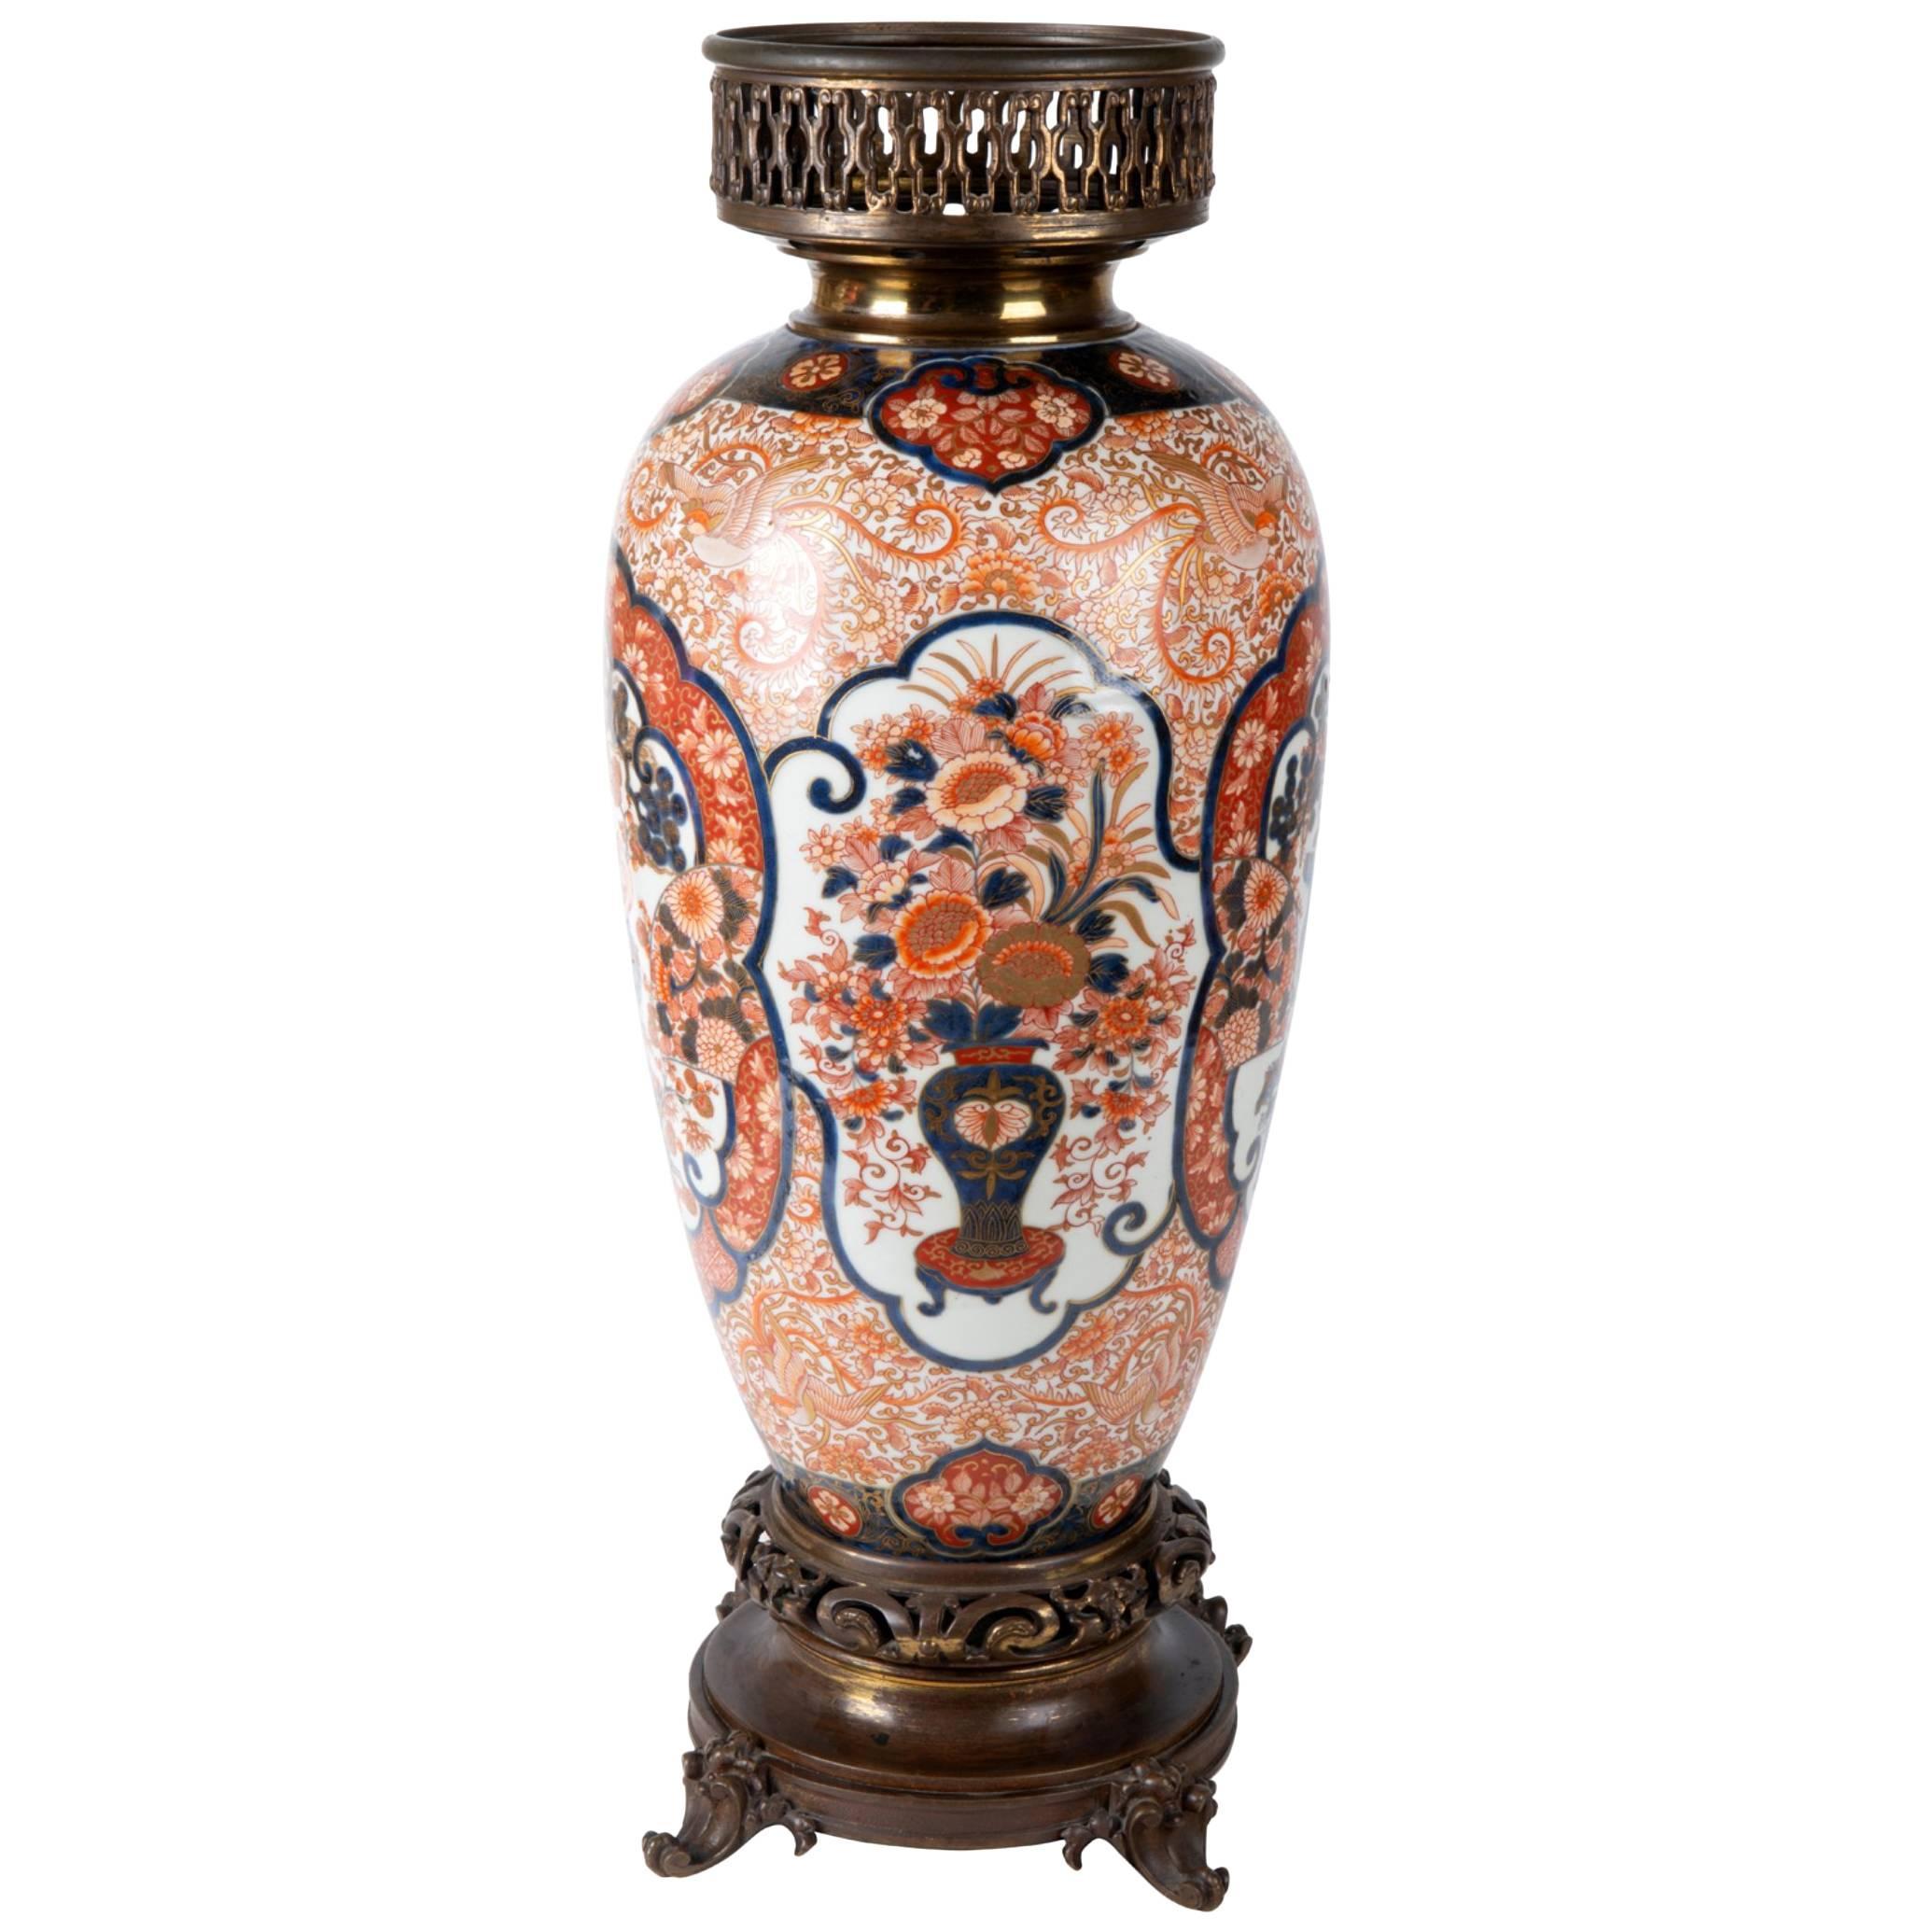 19th Century Japanese Imari Vase or Lamp